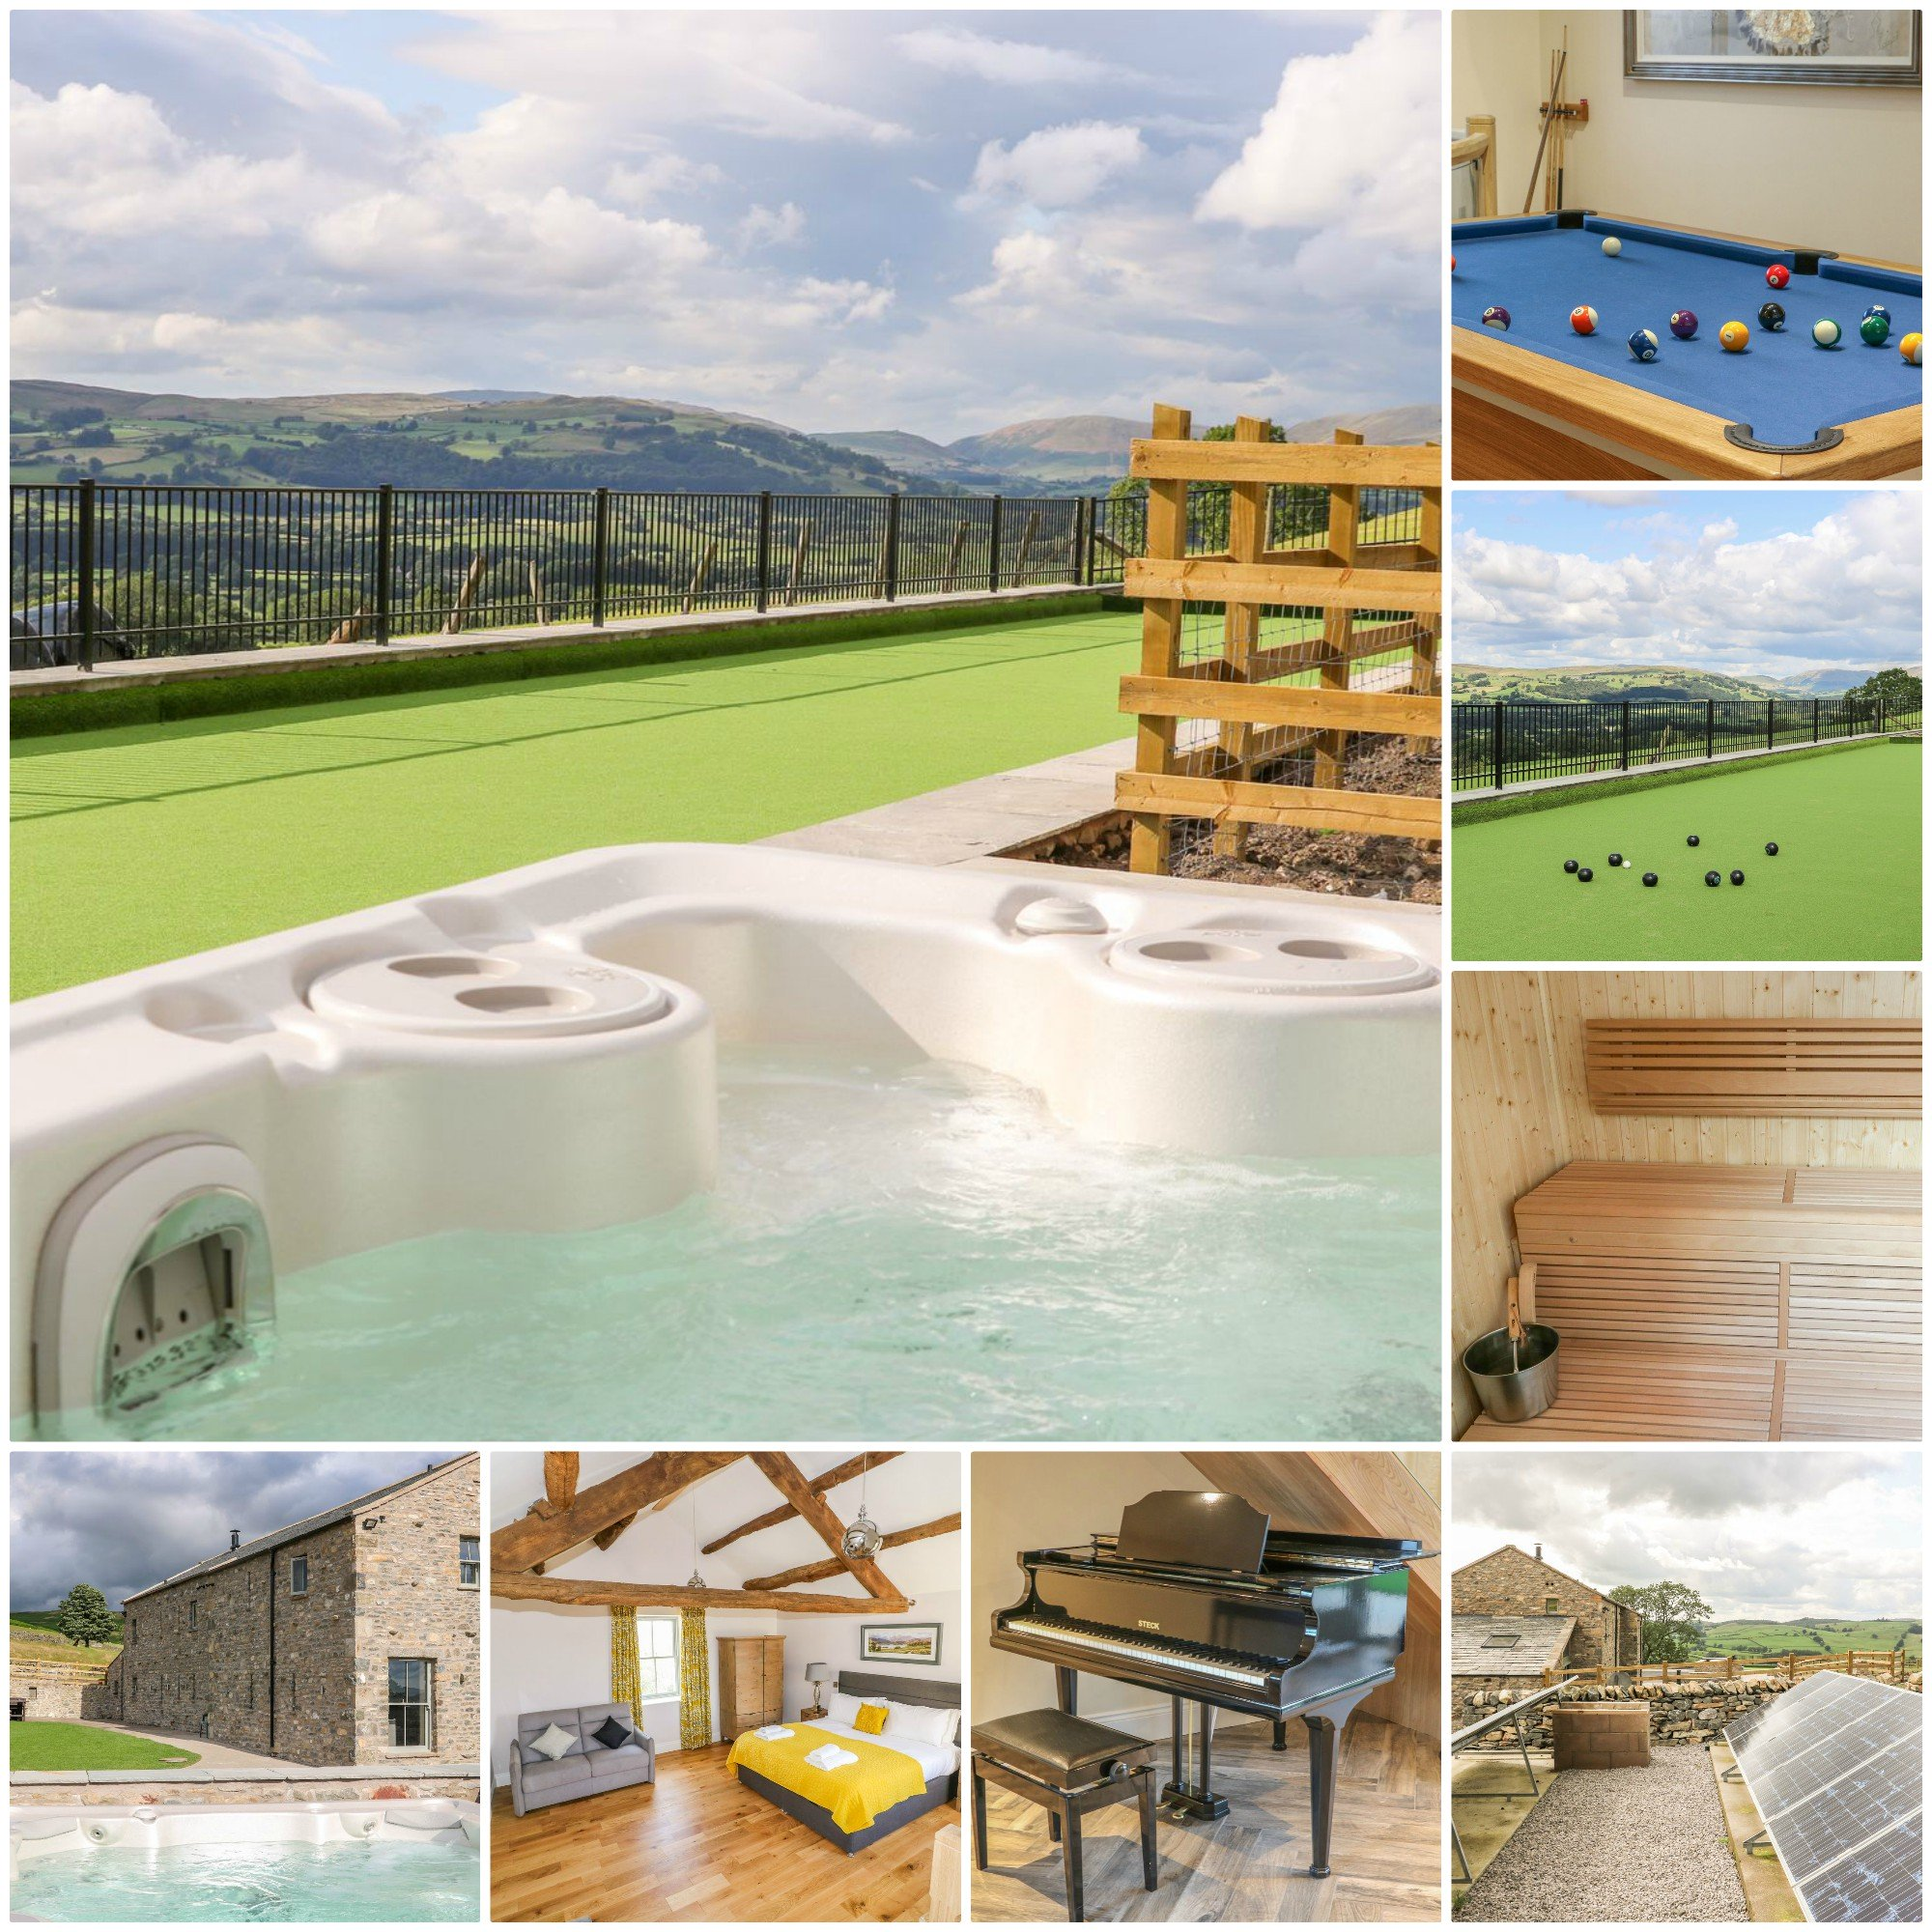 beautiful countryside, a hot tub, sauna and a bowling green!